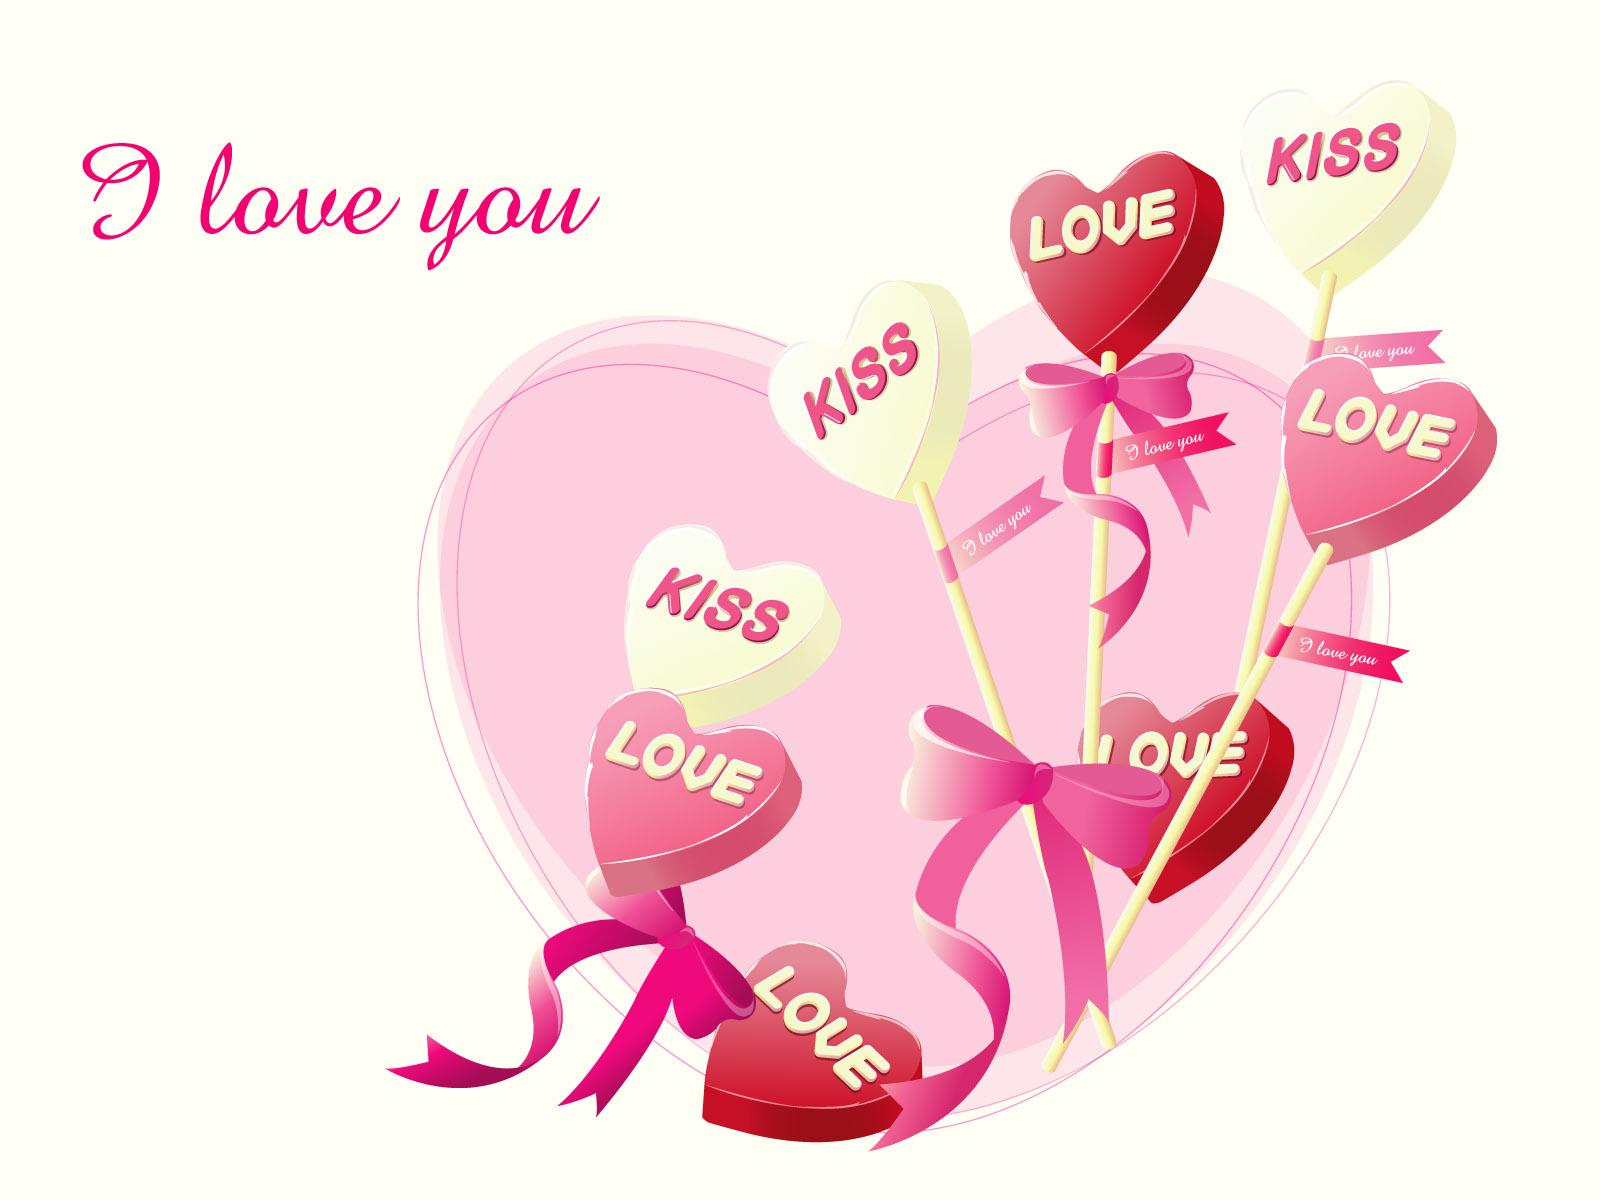 I Love You Wallpapers Hd A18 Hd Desktop Wallpapers 4k Hd